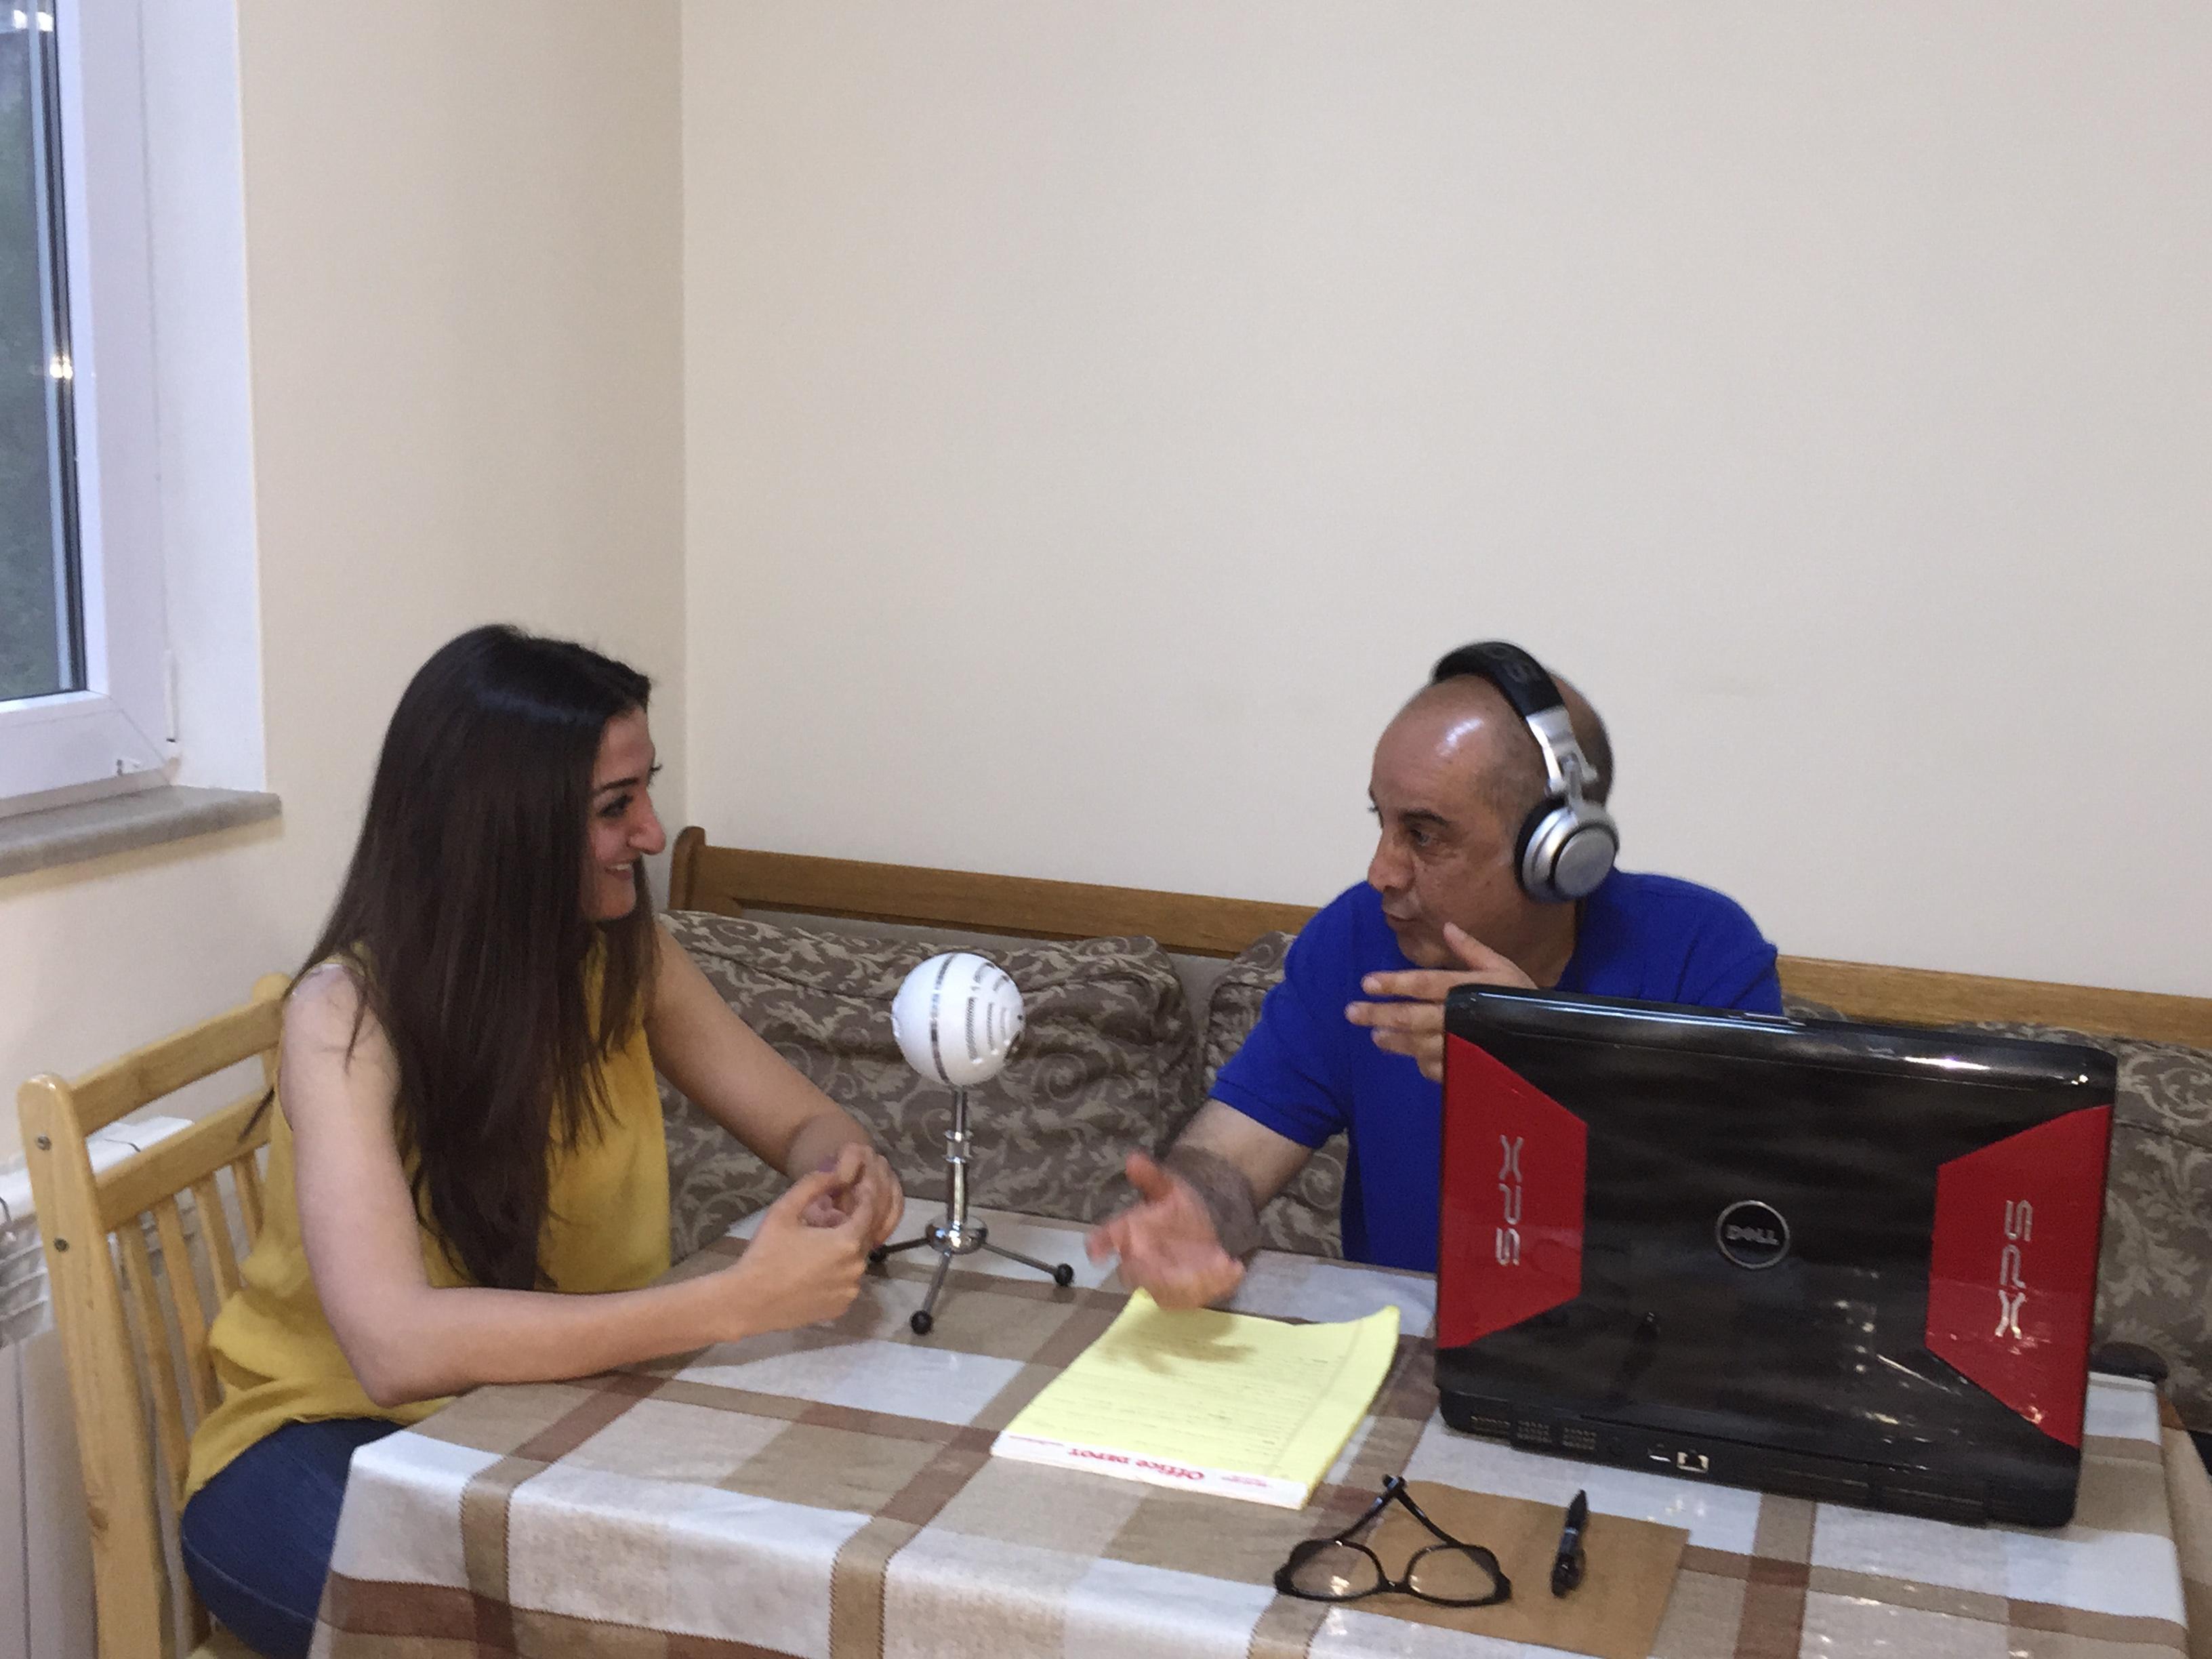 Sevana Tchakerian from Collectif Medz Bazar